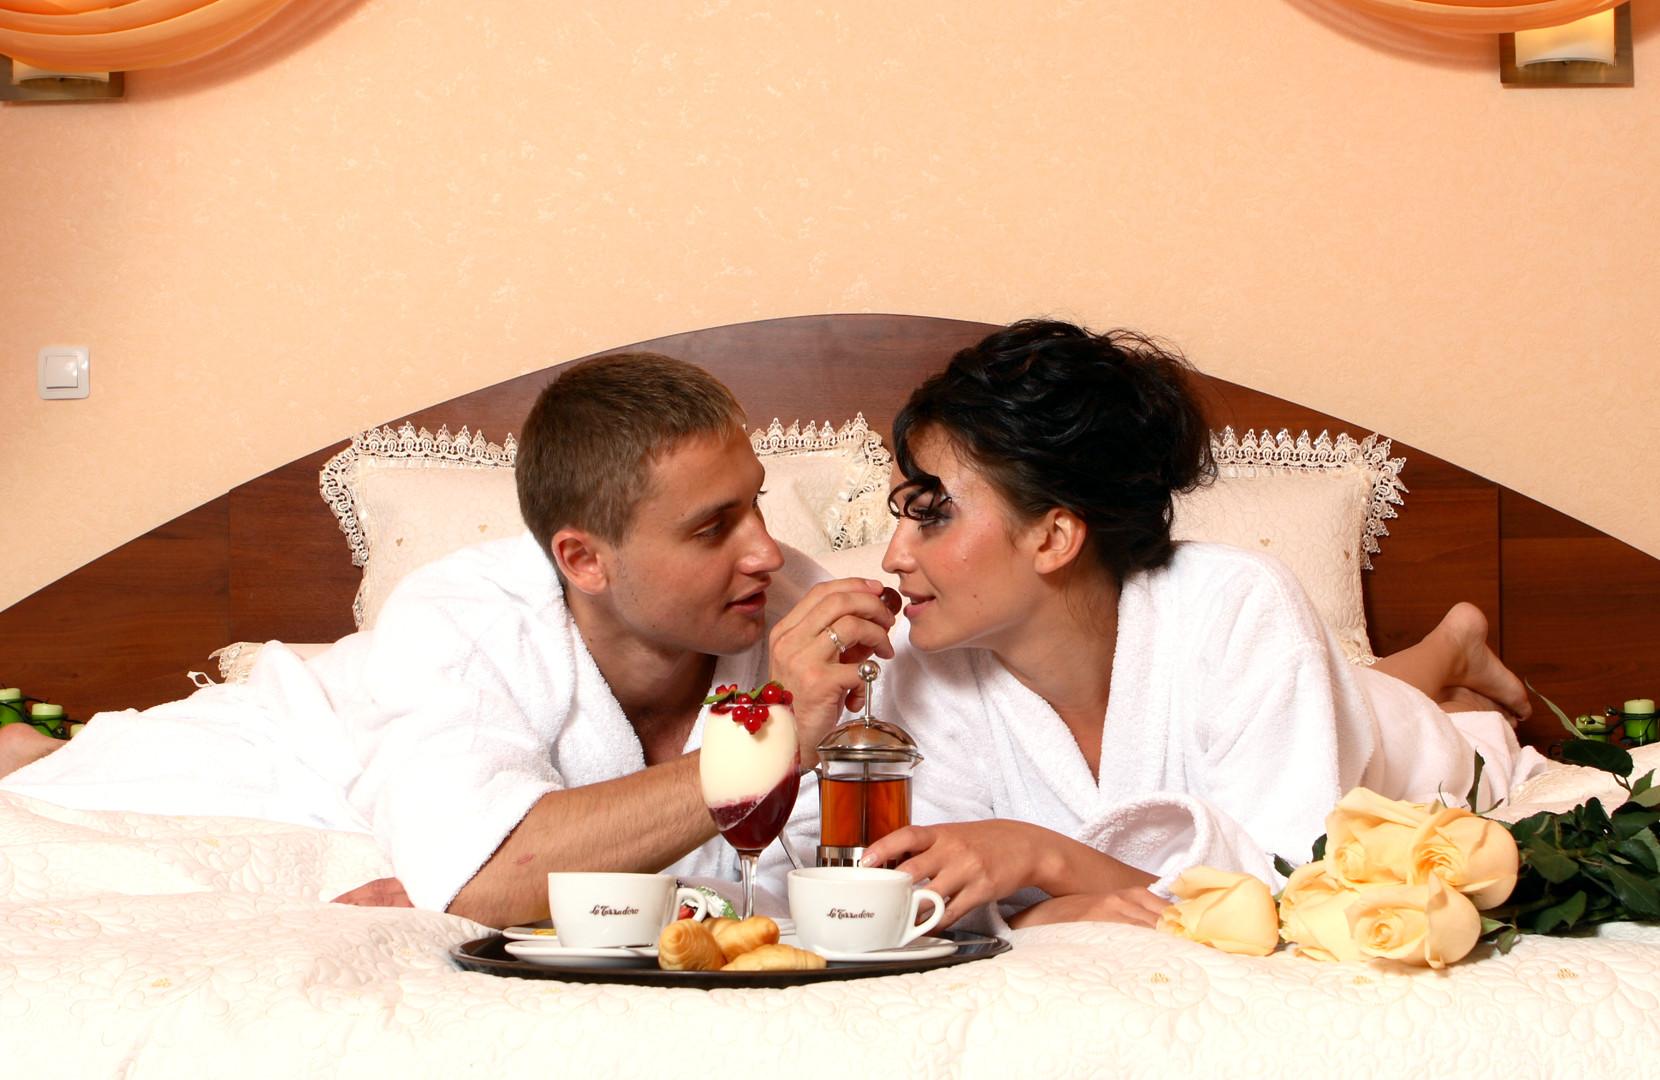 kak-ustroit-romanticheskiy-seks-doma